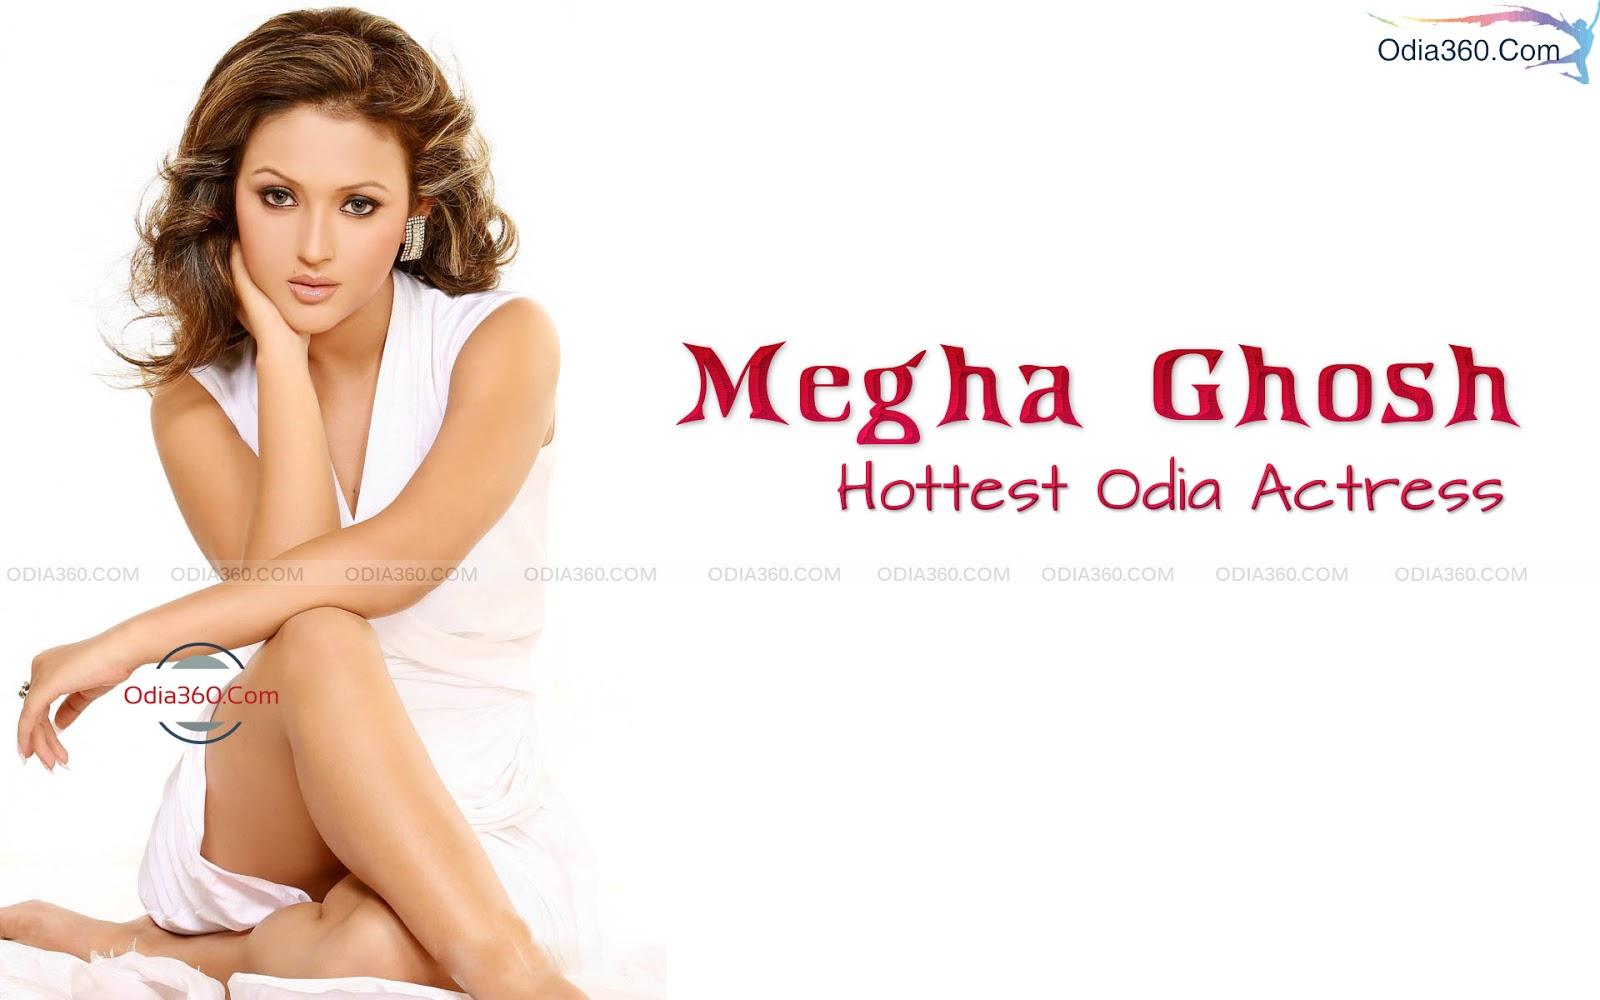 Megha Ghosh Hot Pretty Odia Actress HD Wallpaper Download ...